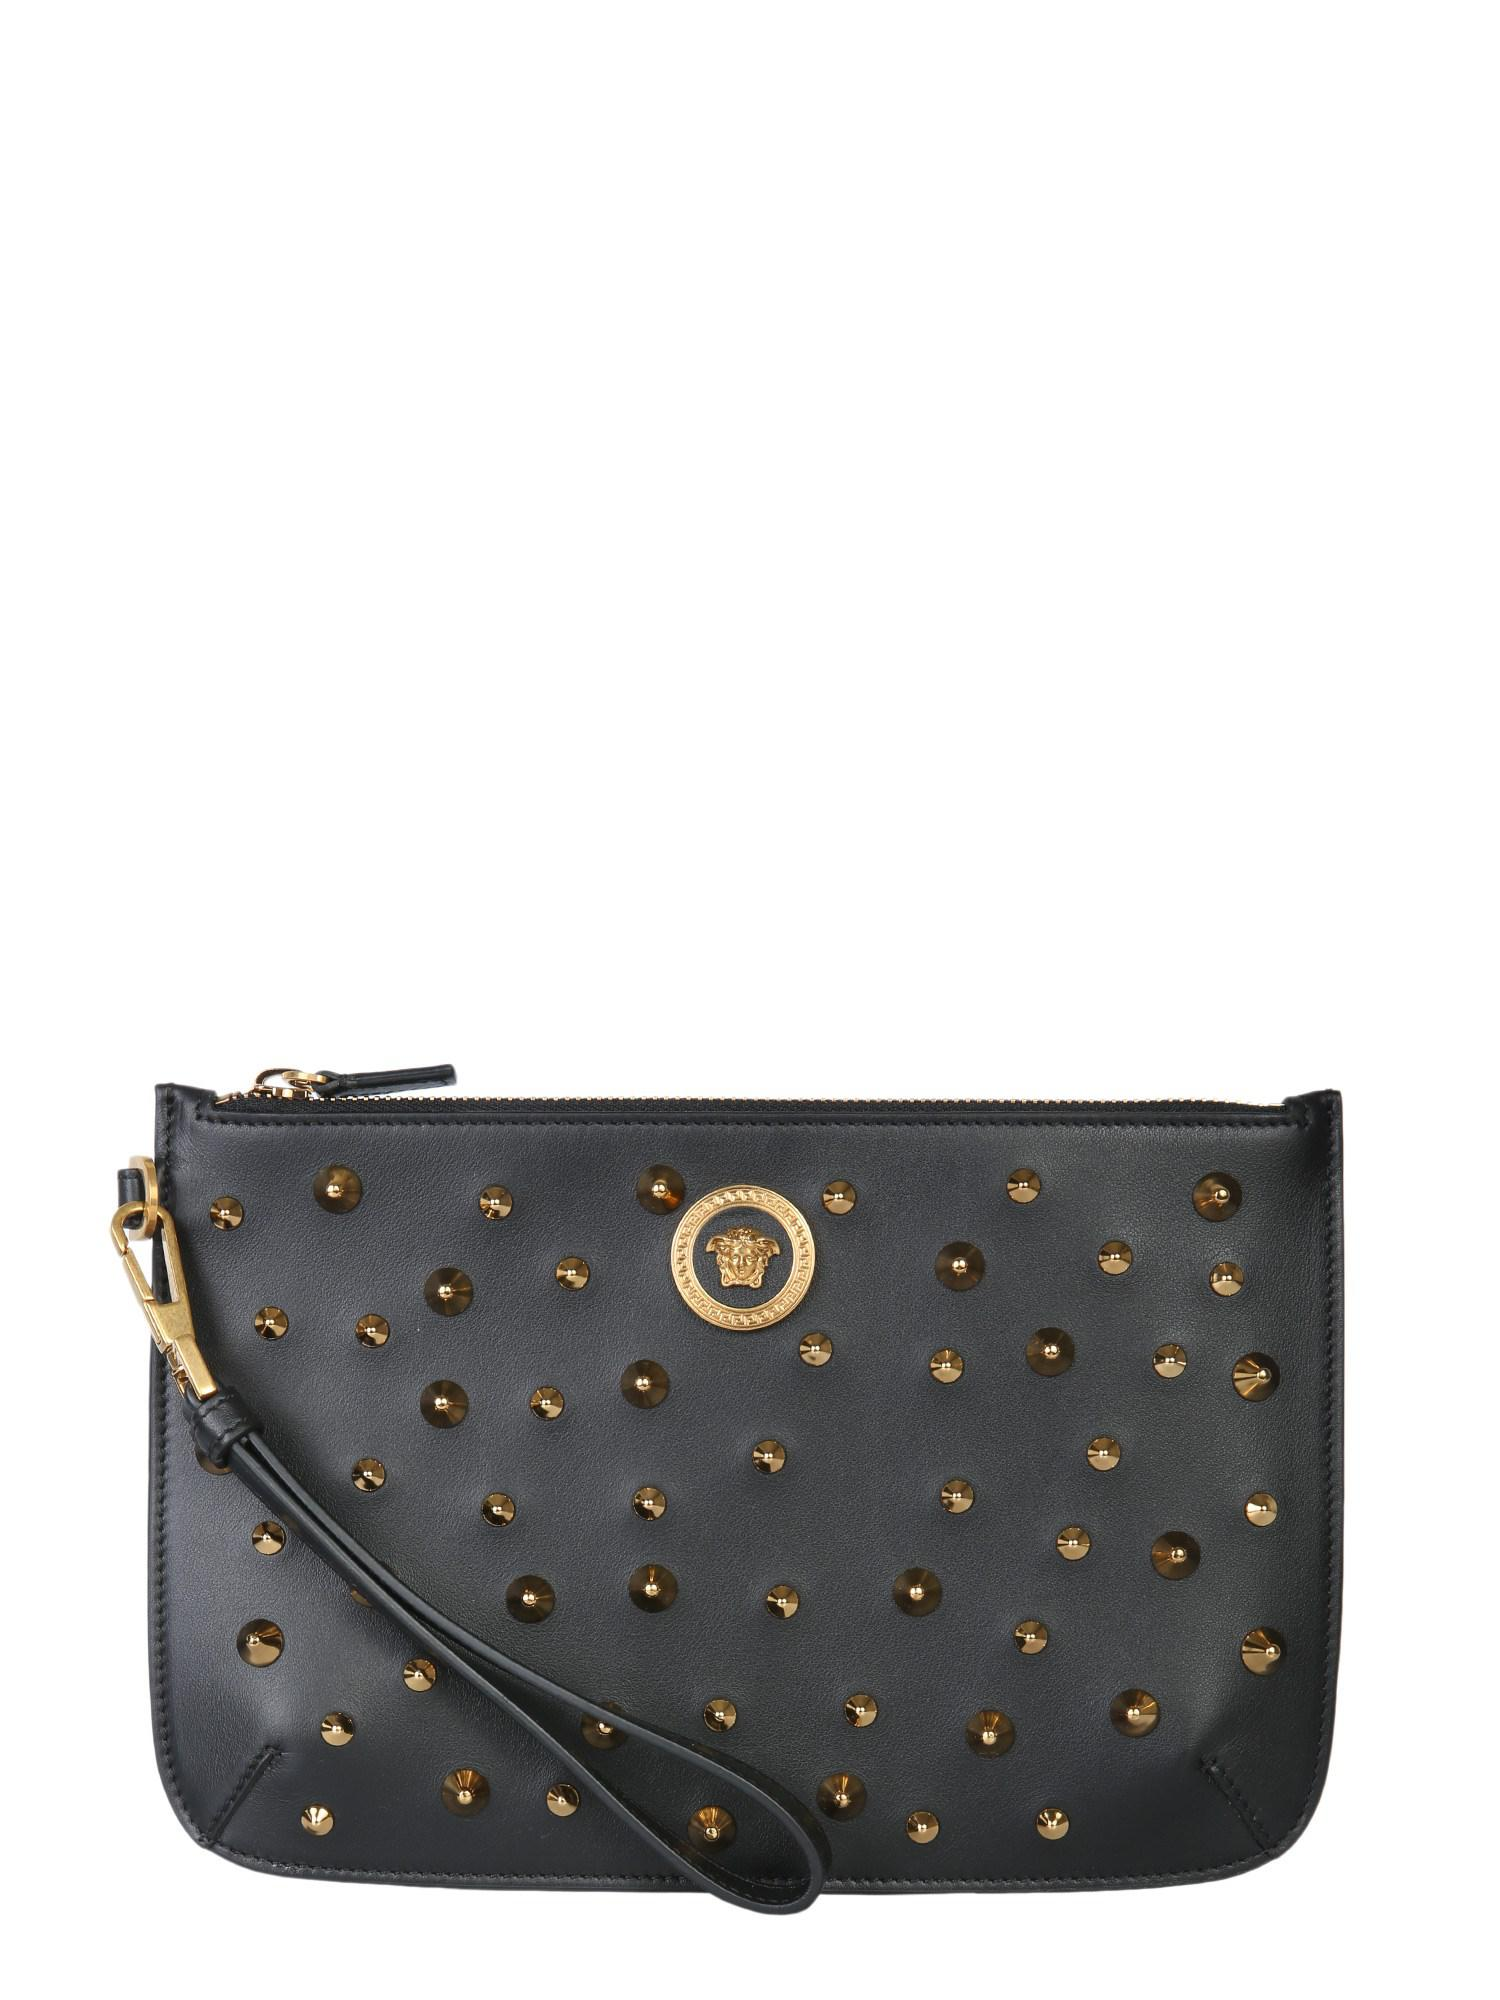 40fea78c4d0c Versace Small Medusa Clutch Bag in Black - Save 16.139240506329116 ...